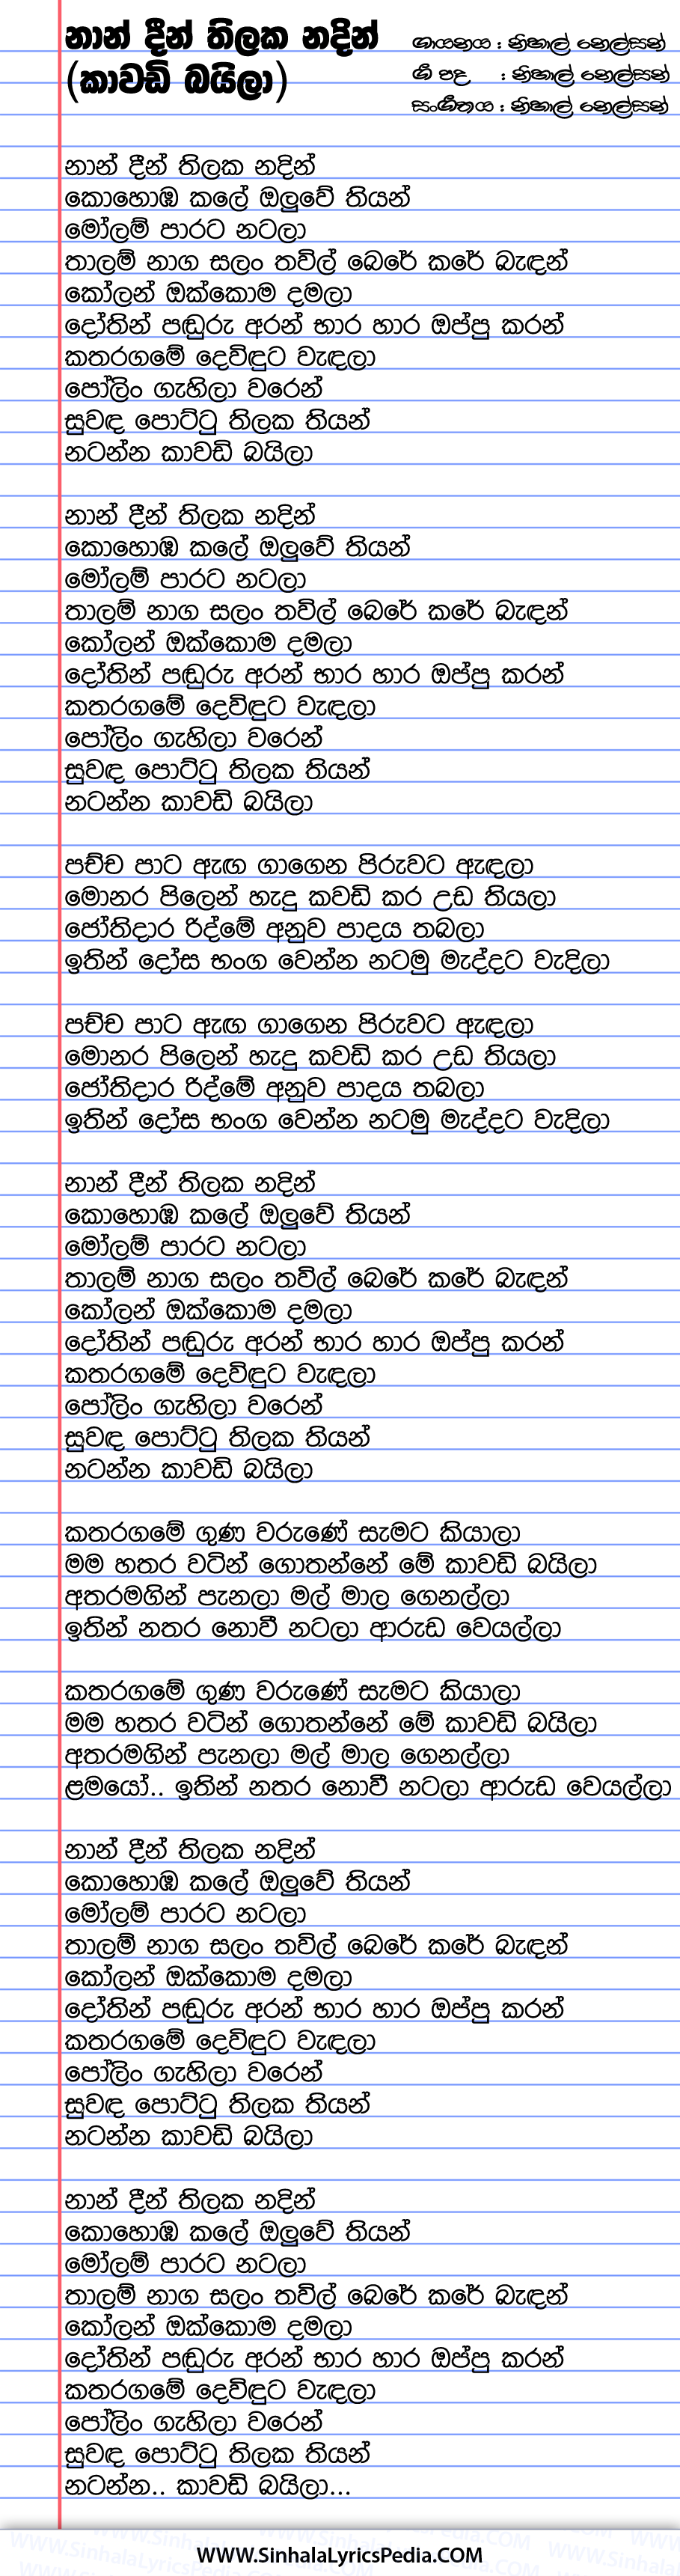 Than Thin Thilaka Nadin (Kawadi Baila) Song Lyrics